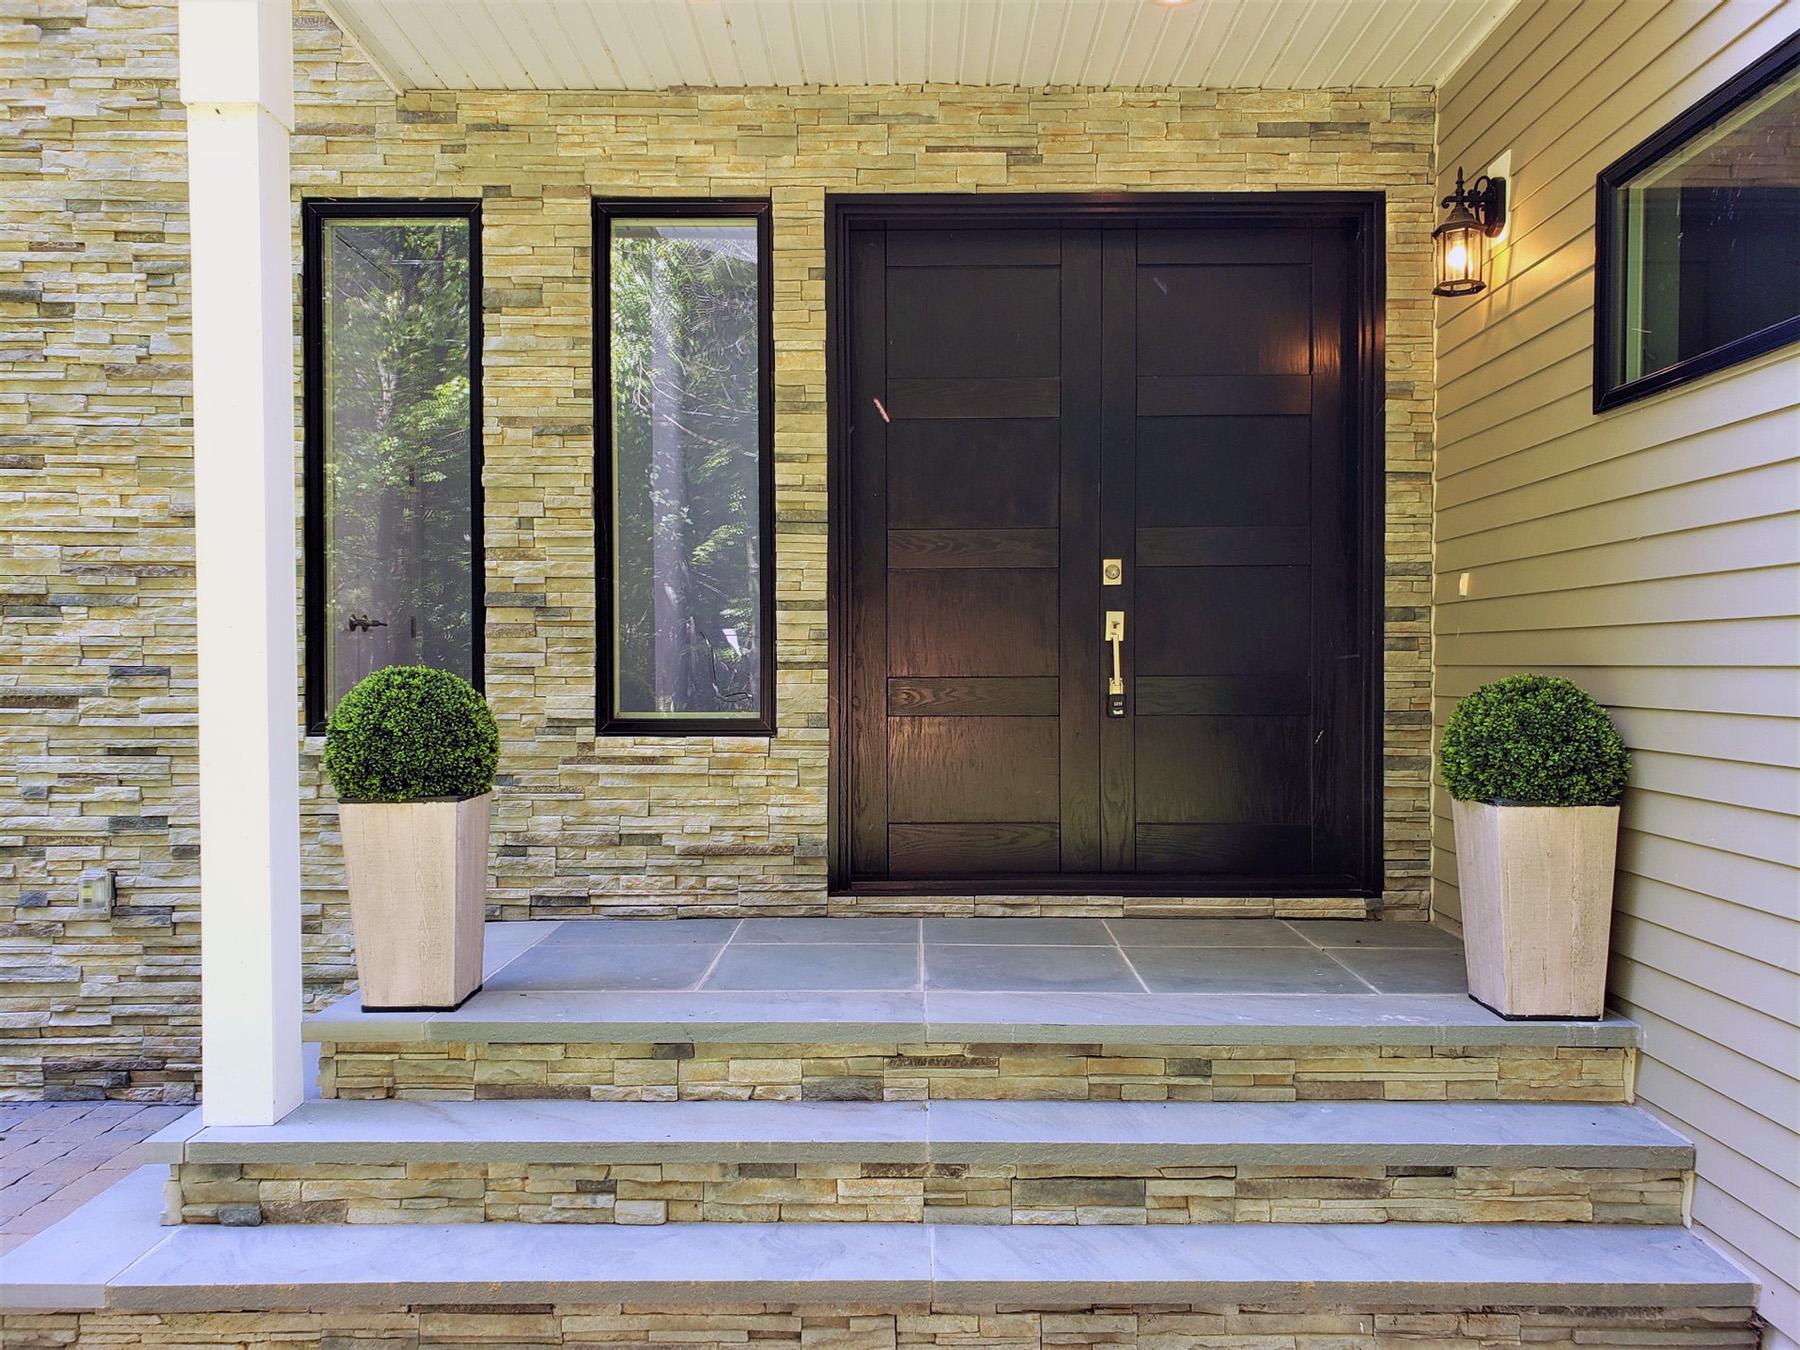 Modern black windows with cultured stone veneer.